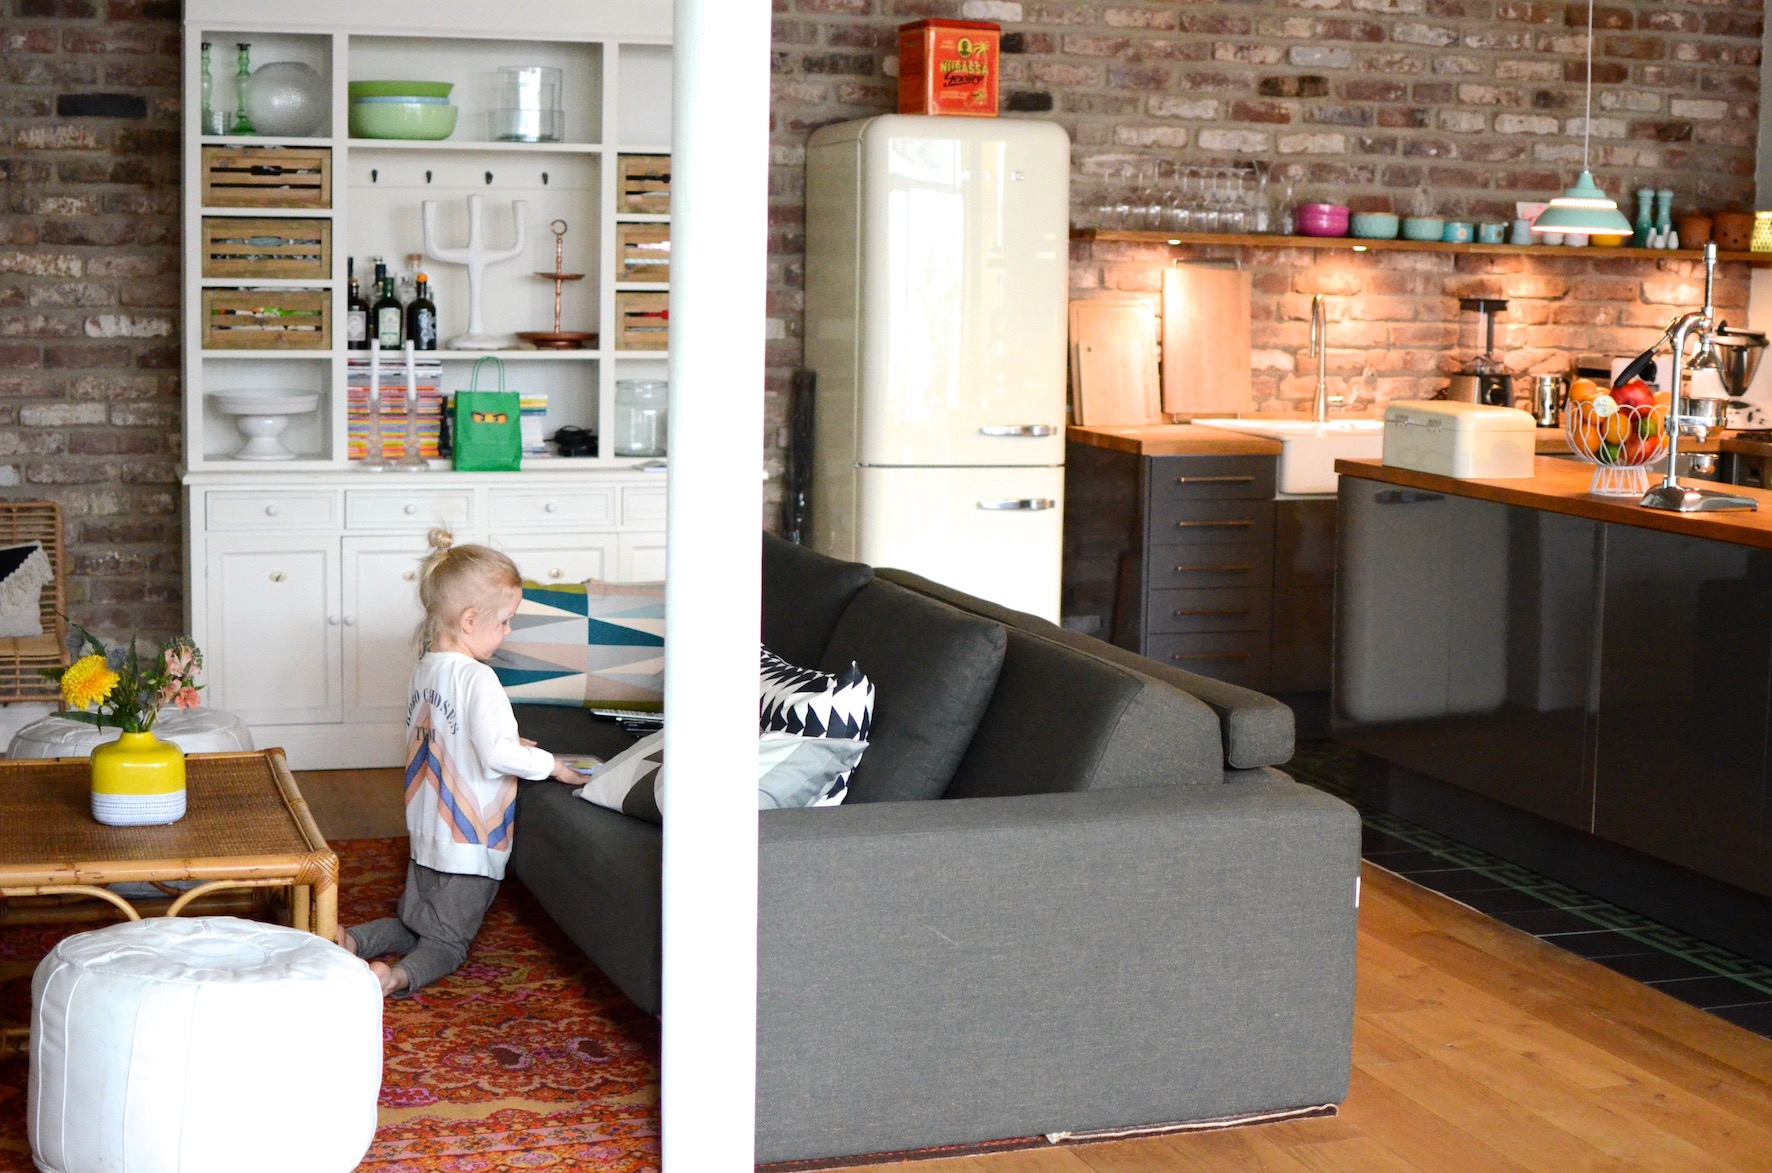 Wohnküche offene Küche SMEG Kühlschrank